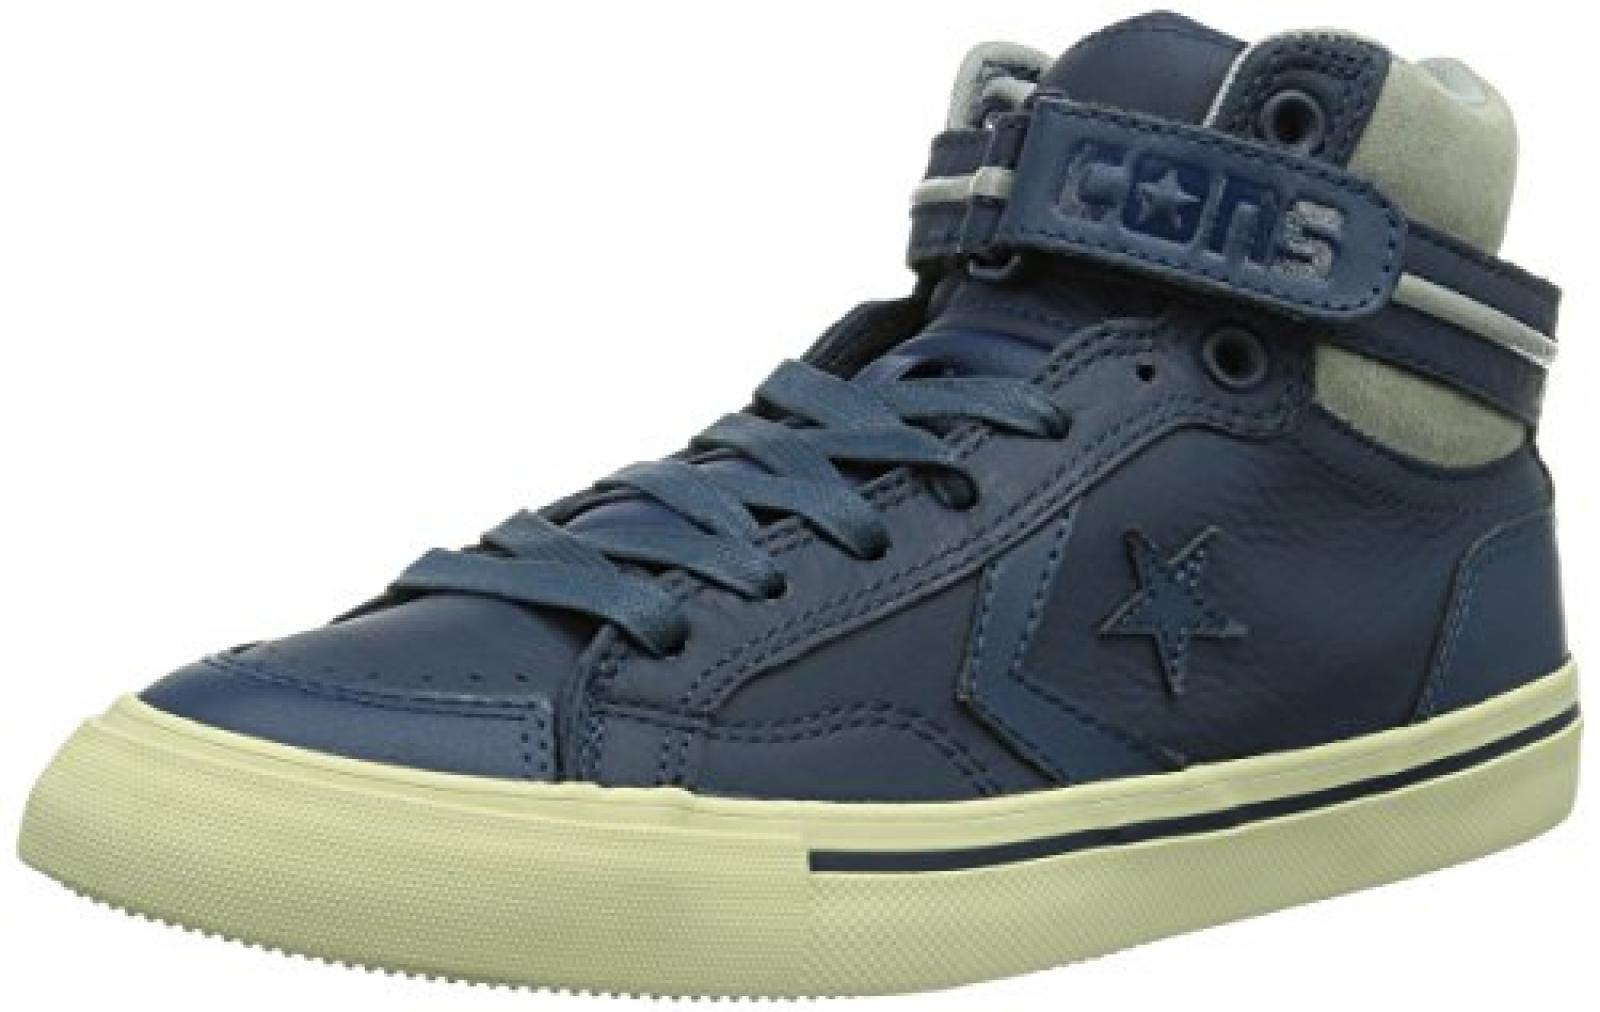 Converse Pro Blaze Adulte Plus 382960 Unisex - Erwachsene Sneaker